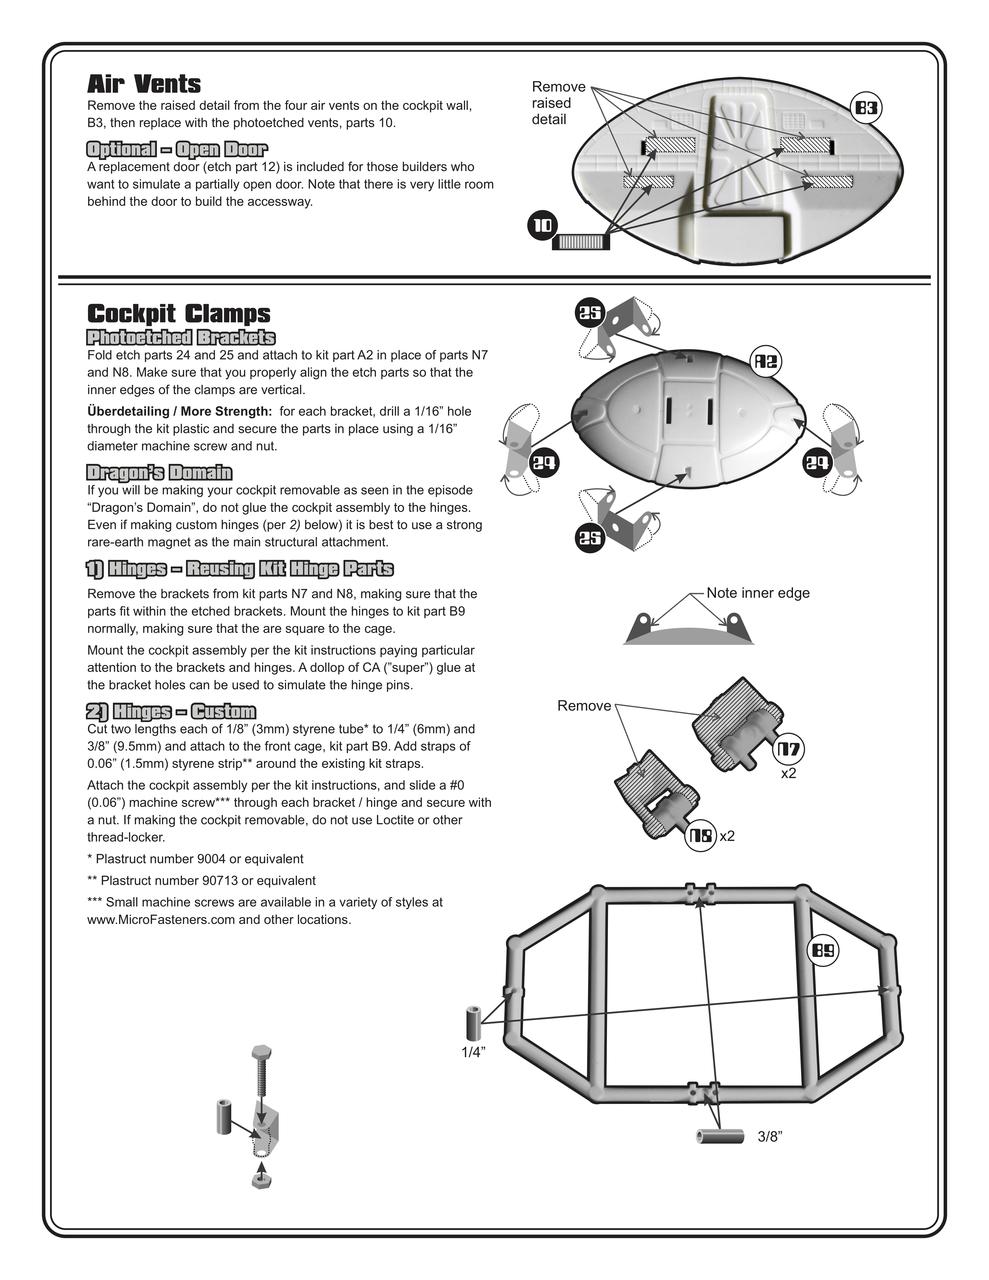 space-1999-22-inch-eagle-photoetch-set-1-48-scale-pgx199-.jpg